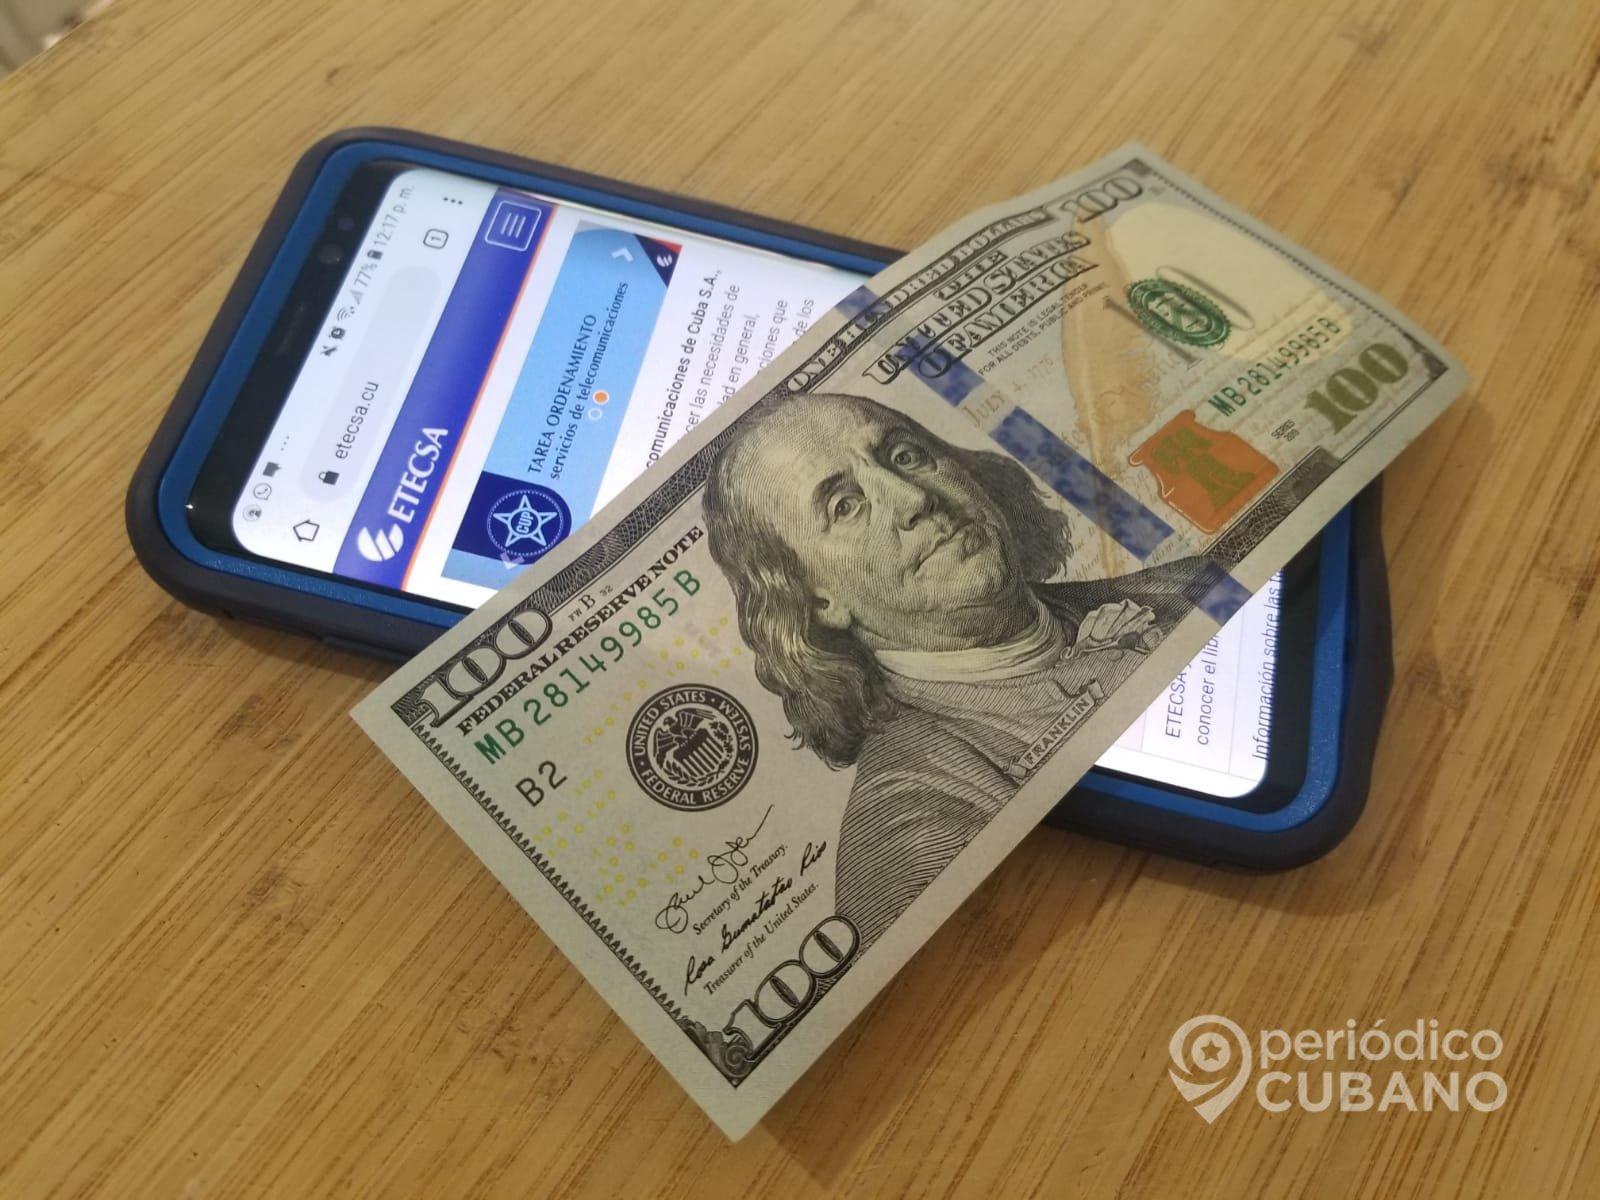 Etecsa transfers and electronic balance to Cuba